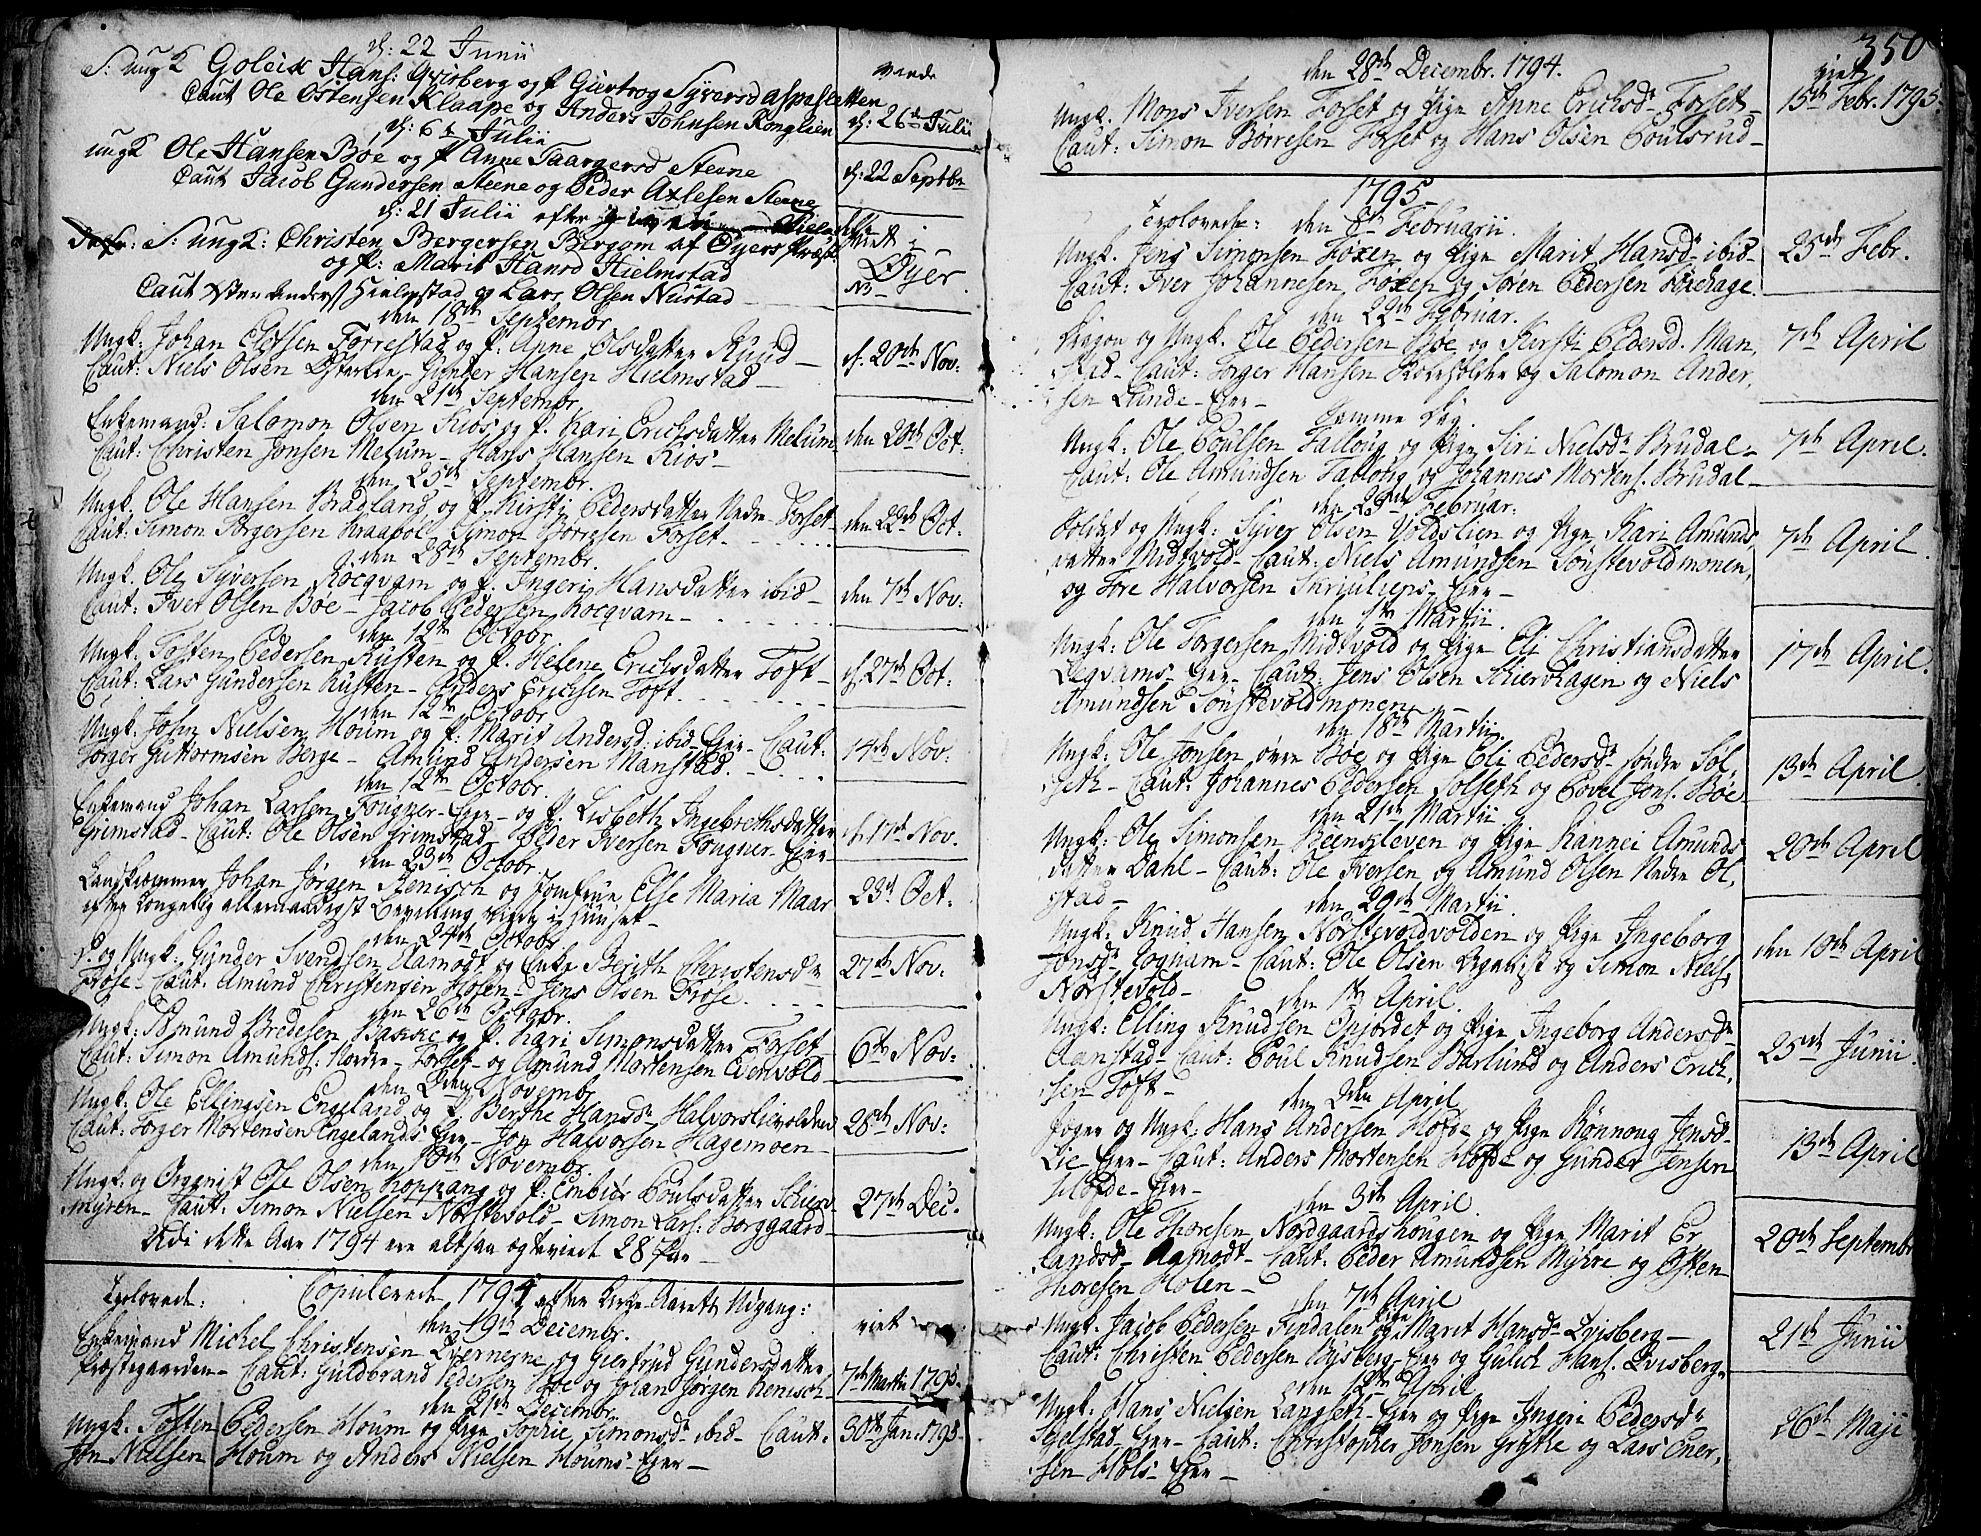 SAH, Gausdal prestekontor, Ministerialbok nr. 3, 1758-1809, s. 350